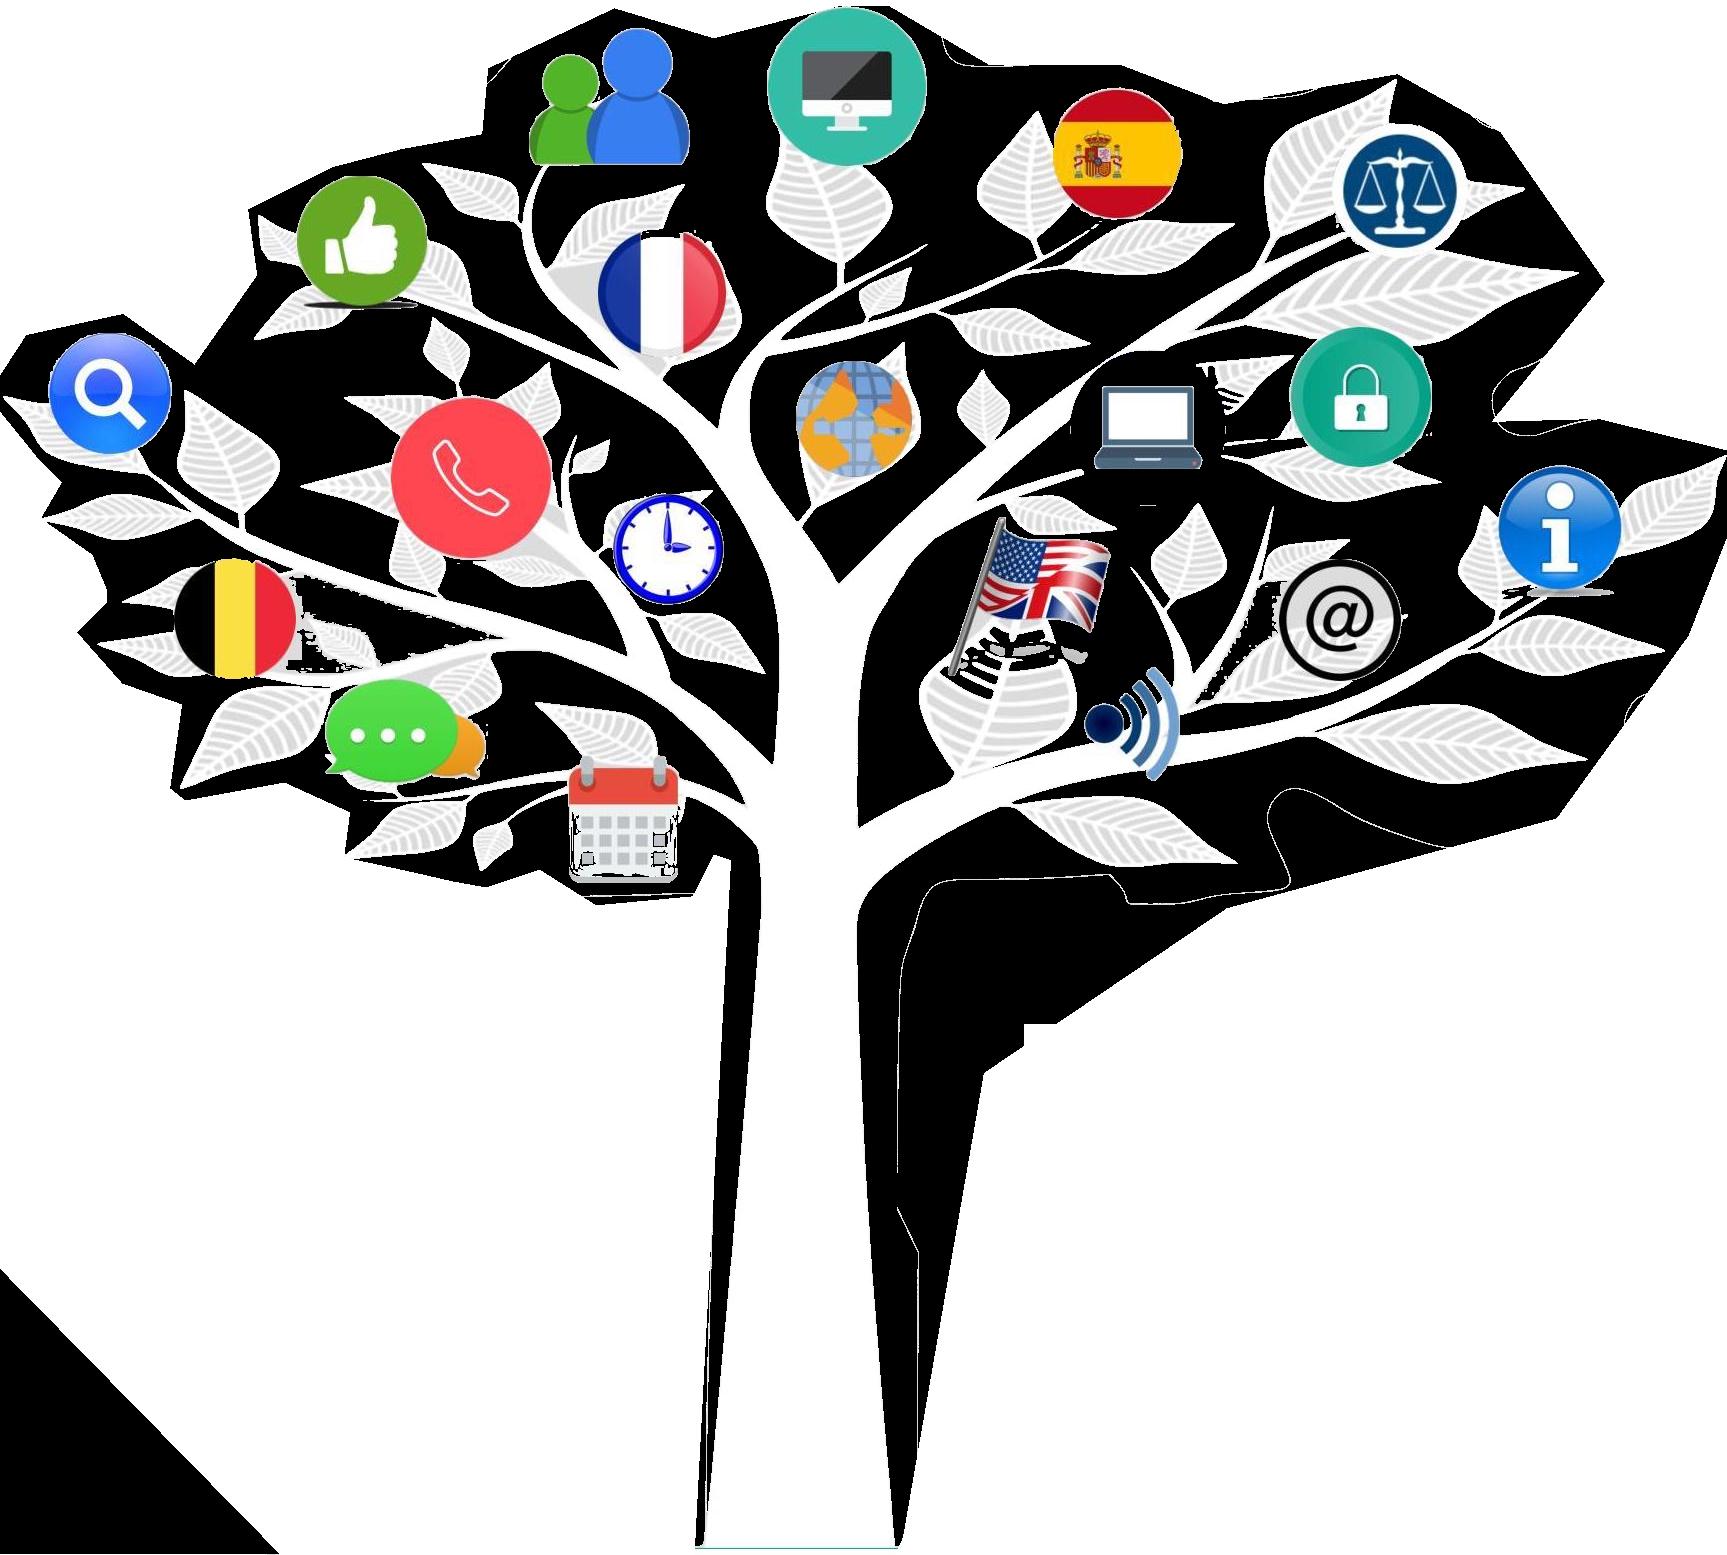 arbre de vie avec différentes icones